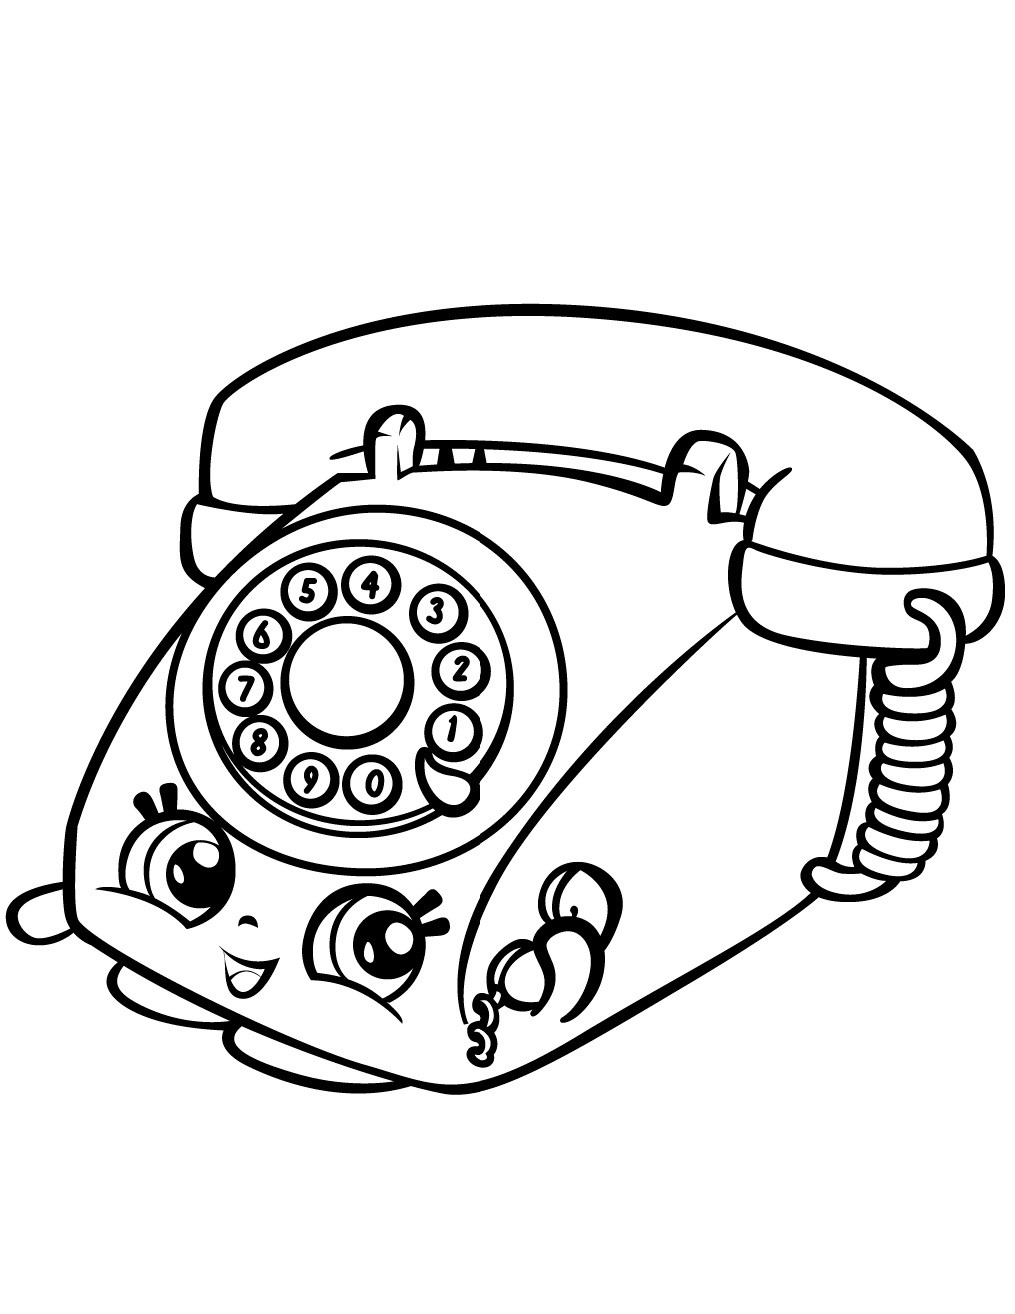 Hopkins Phone